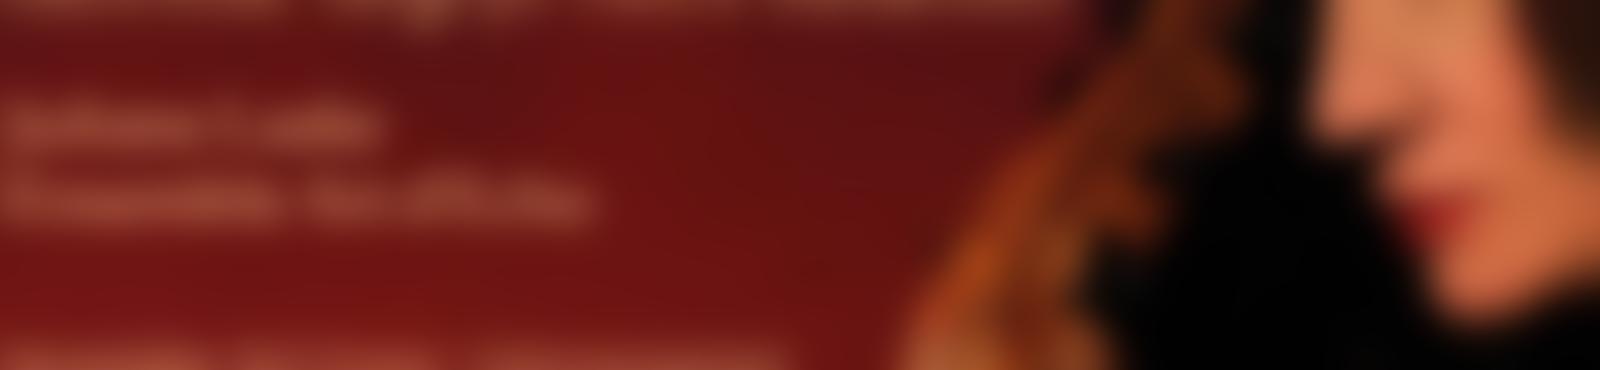 Blurred 8f84a495 48e4 4fba b8ba 9e3415f674c4